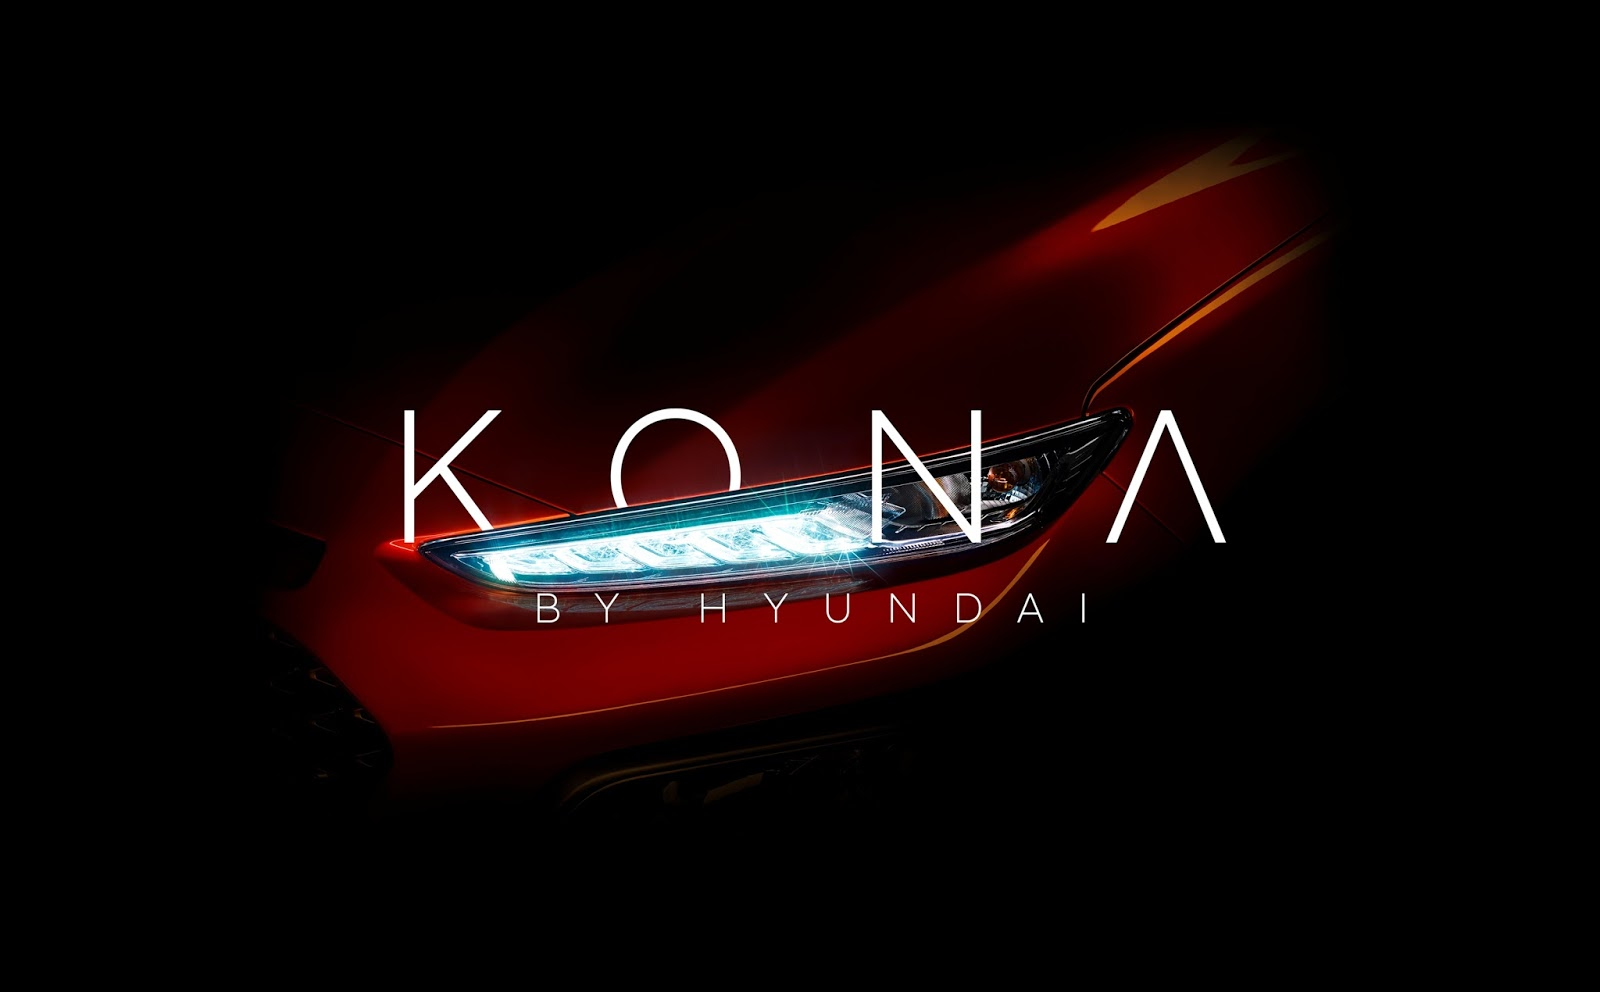 Hyundai Kona Teaser Image Kona θα λέγεται το νέo Compact SUV της Hyundai compact SUV, Hyundai, Hyundai Kona, Prototype, teaser